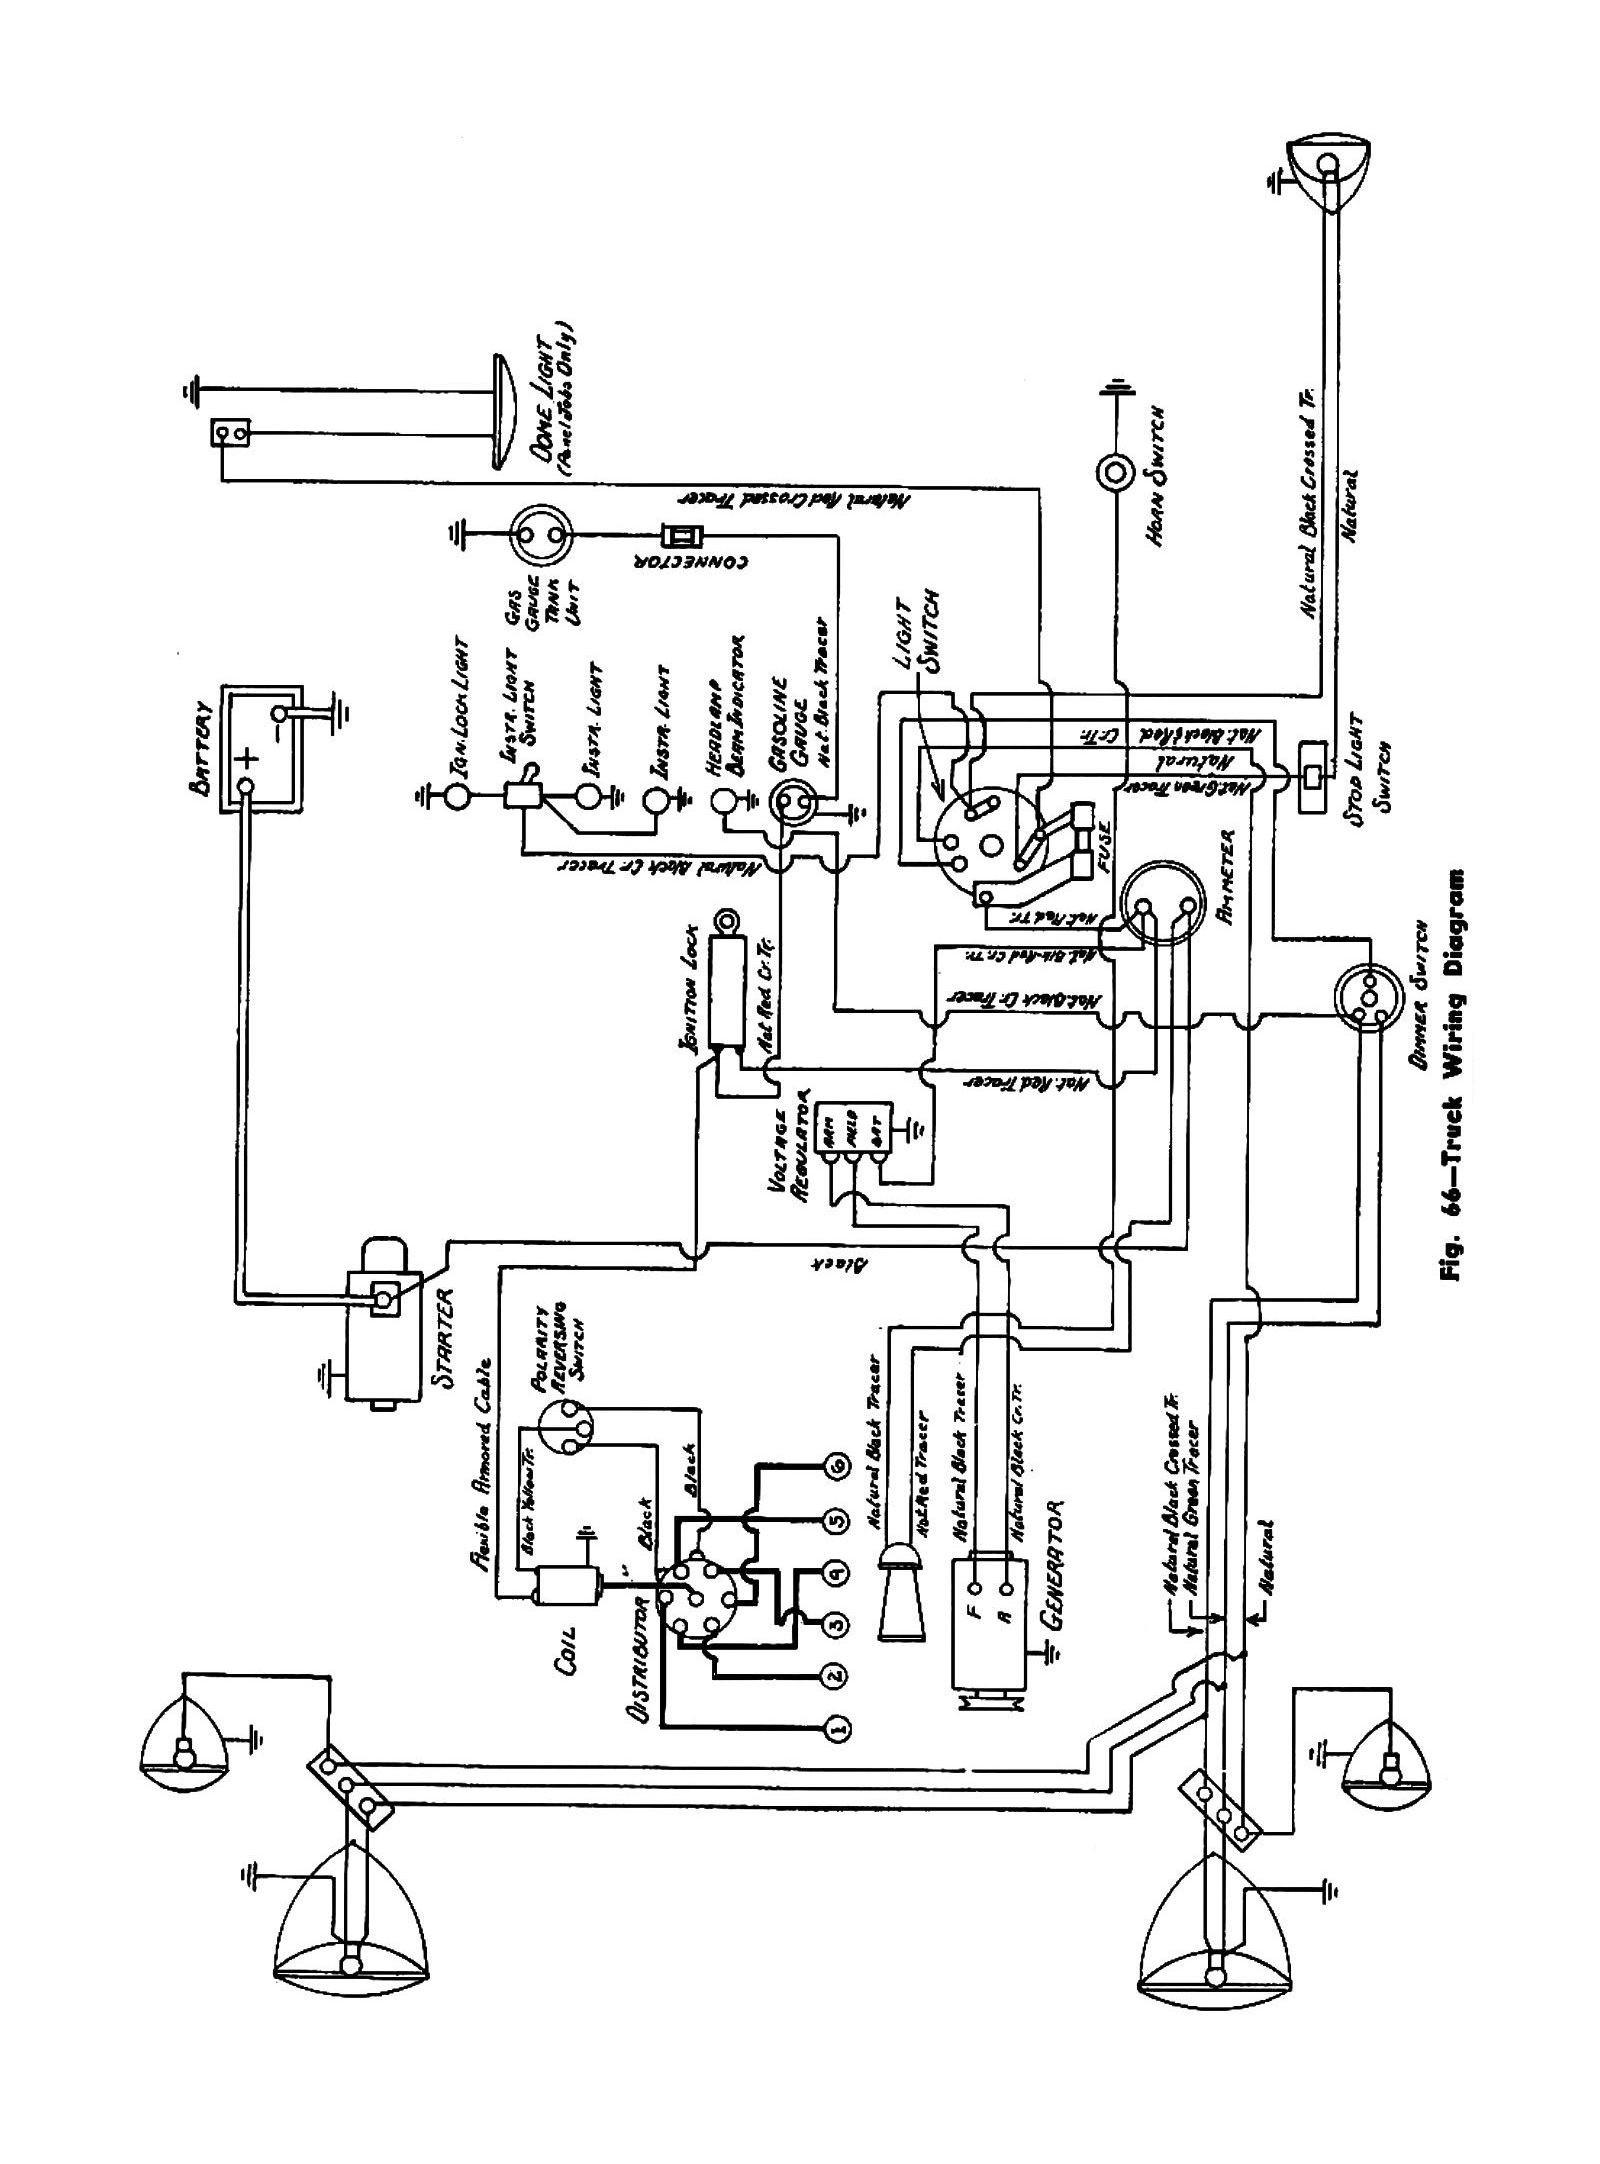 1977 dodge power wagon wiring diagram wiring diagram Dodge Truck Wiring Diagram power window wiring diagram 1 you dodge truck wiring diagram